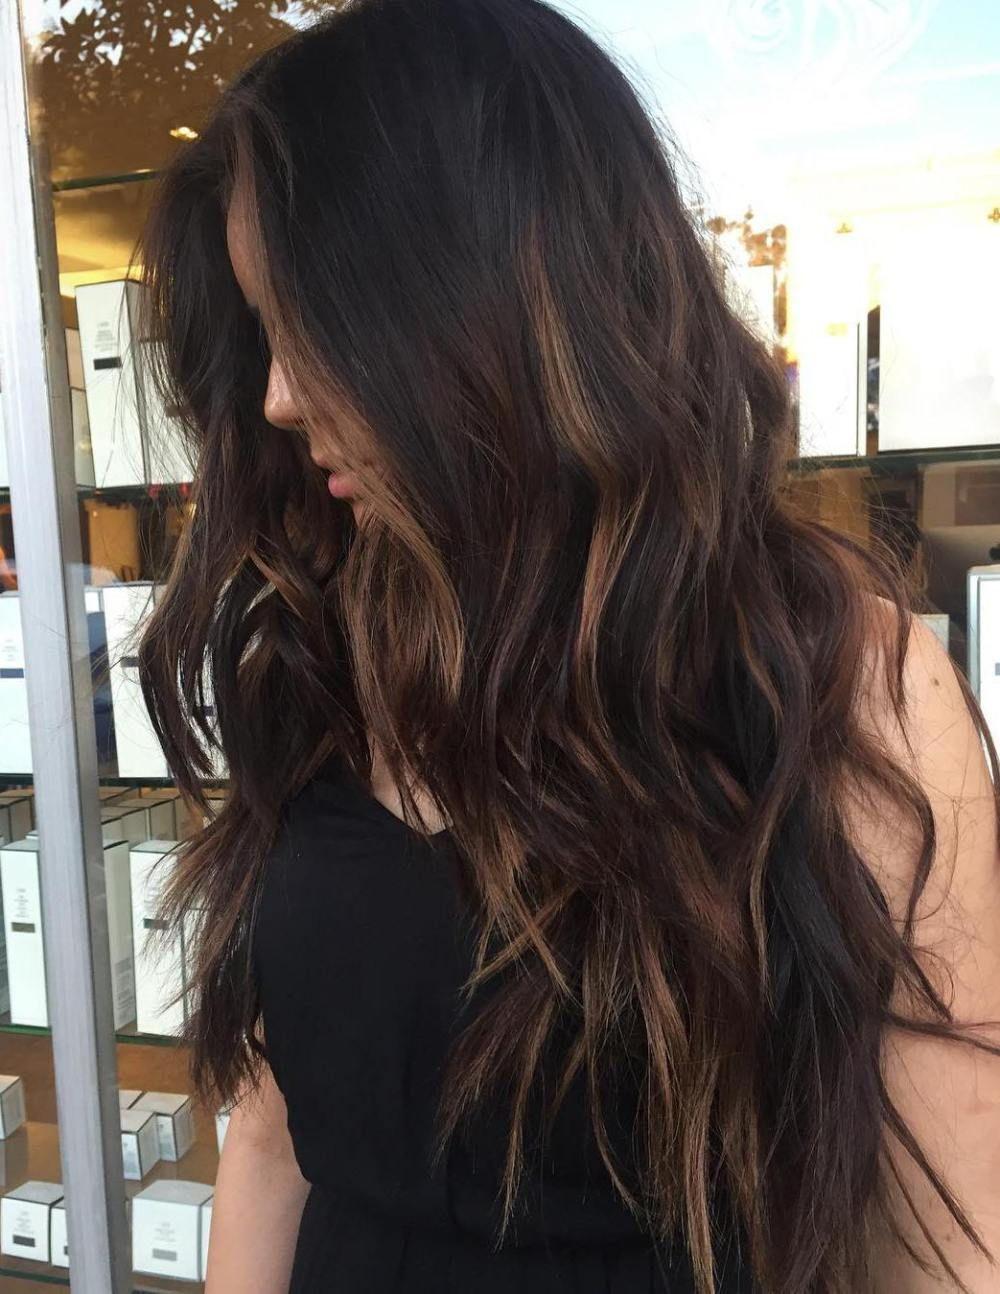 Long Hair With Subtle Caramel Balayage Balayage Hair Hair Styles Long Hair Styles